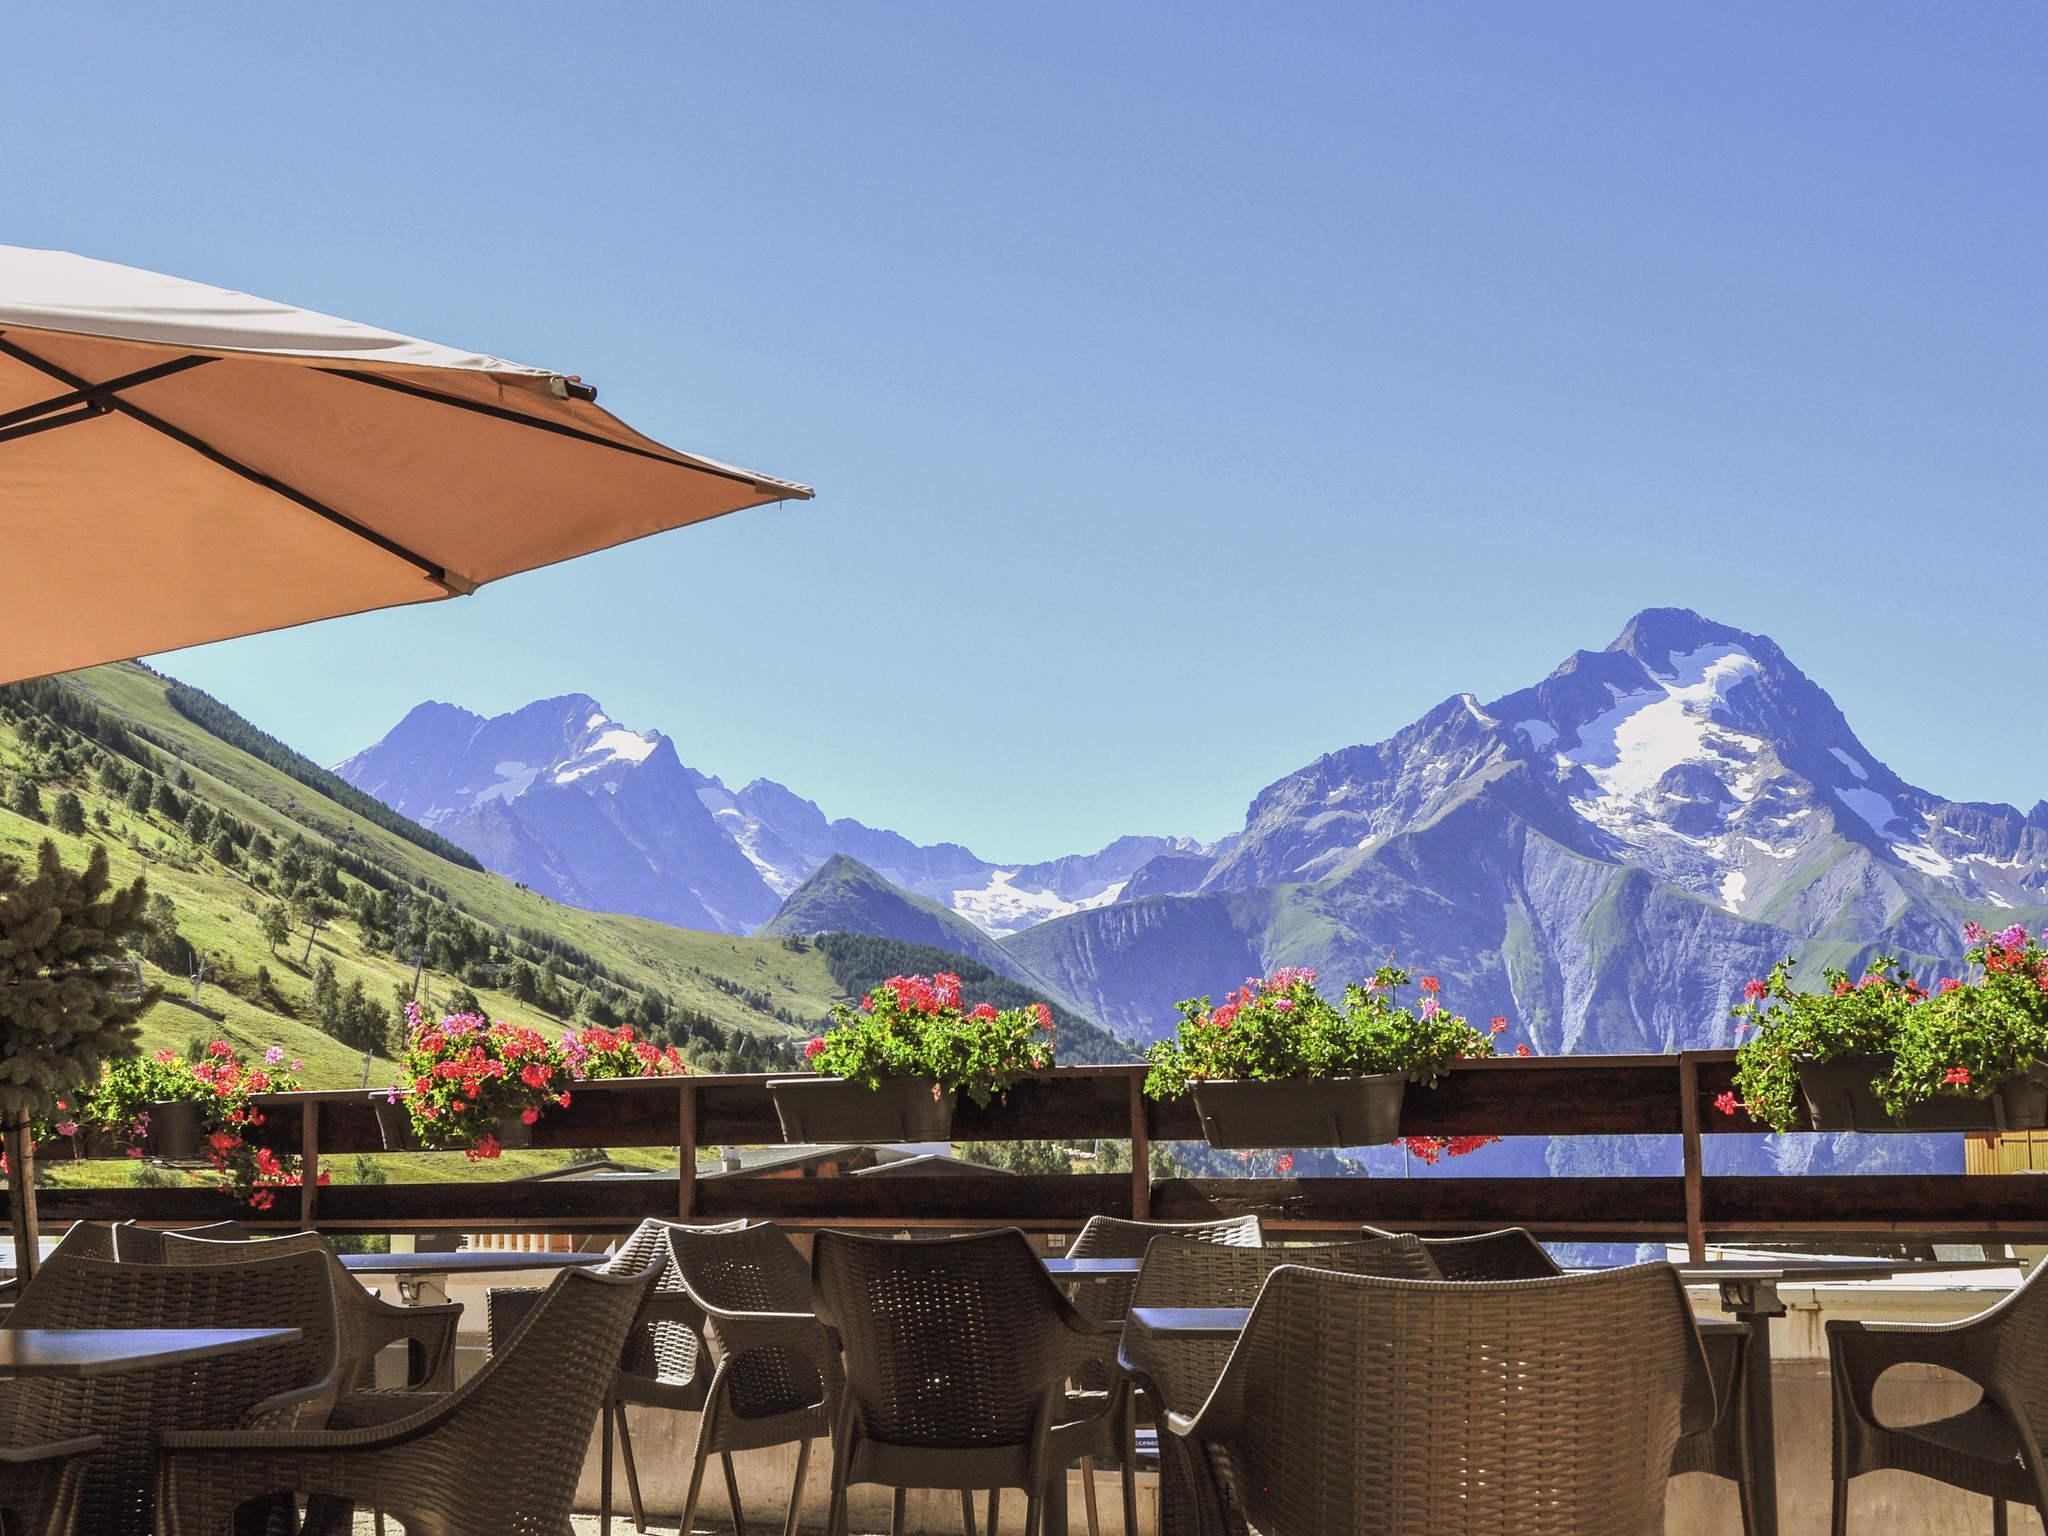 Hotel – Albergo Mercure Les Deux Alpes 1800